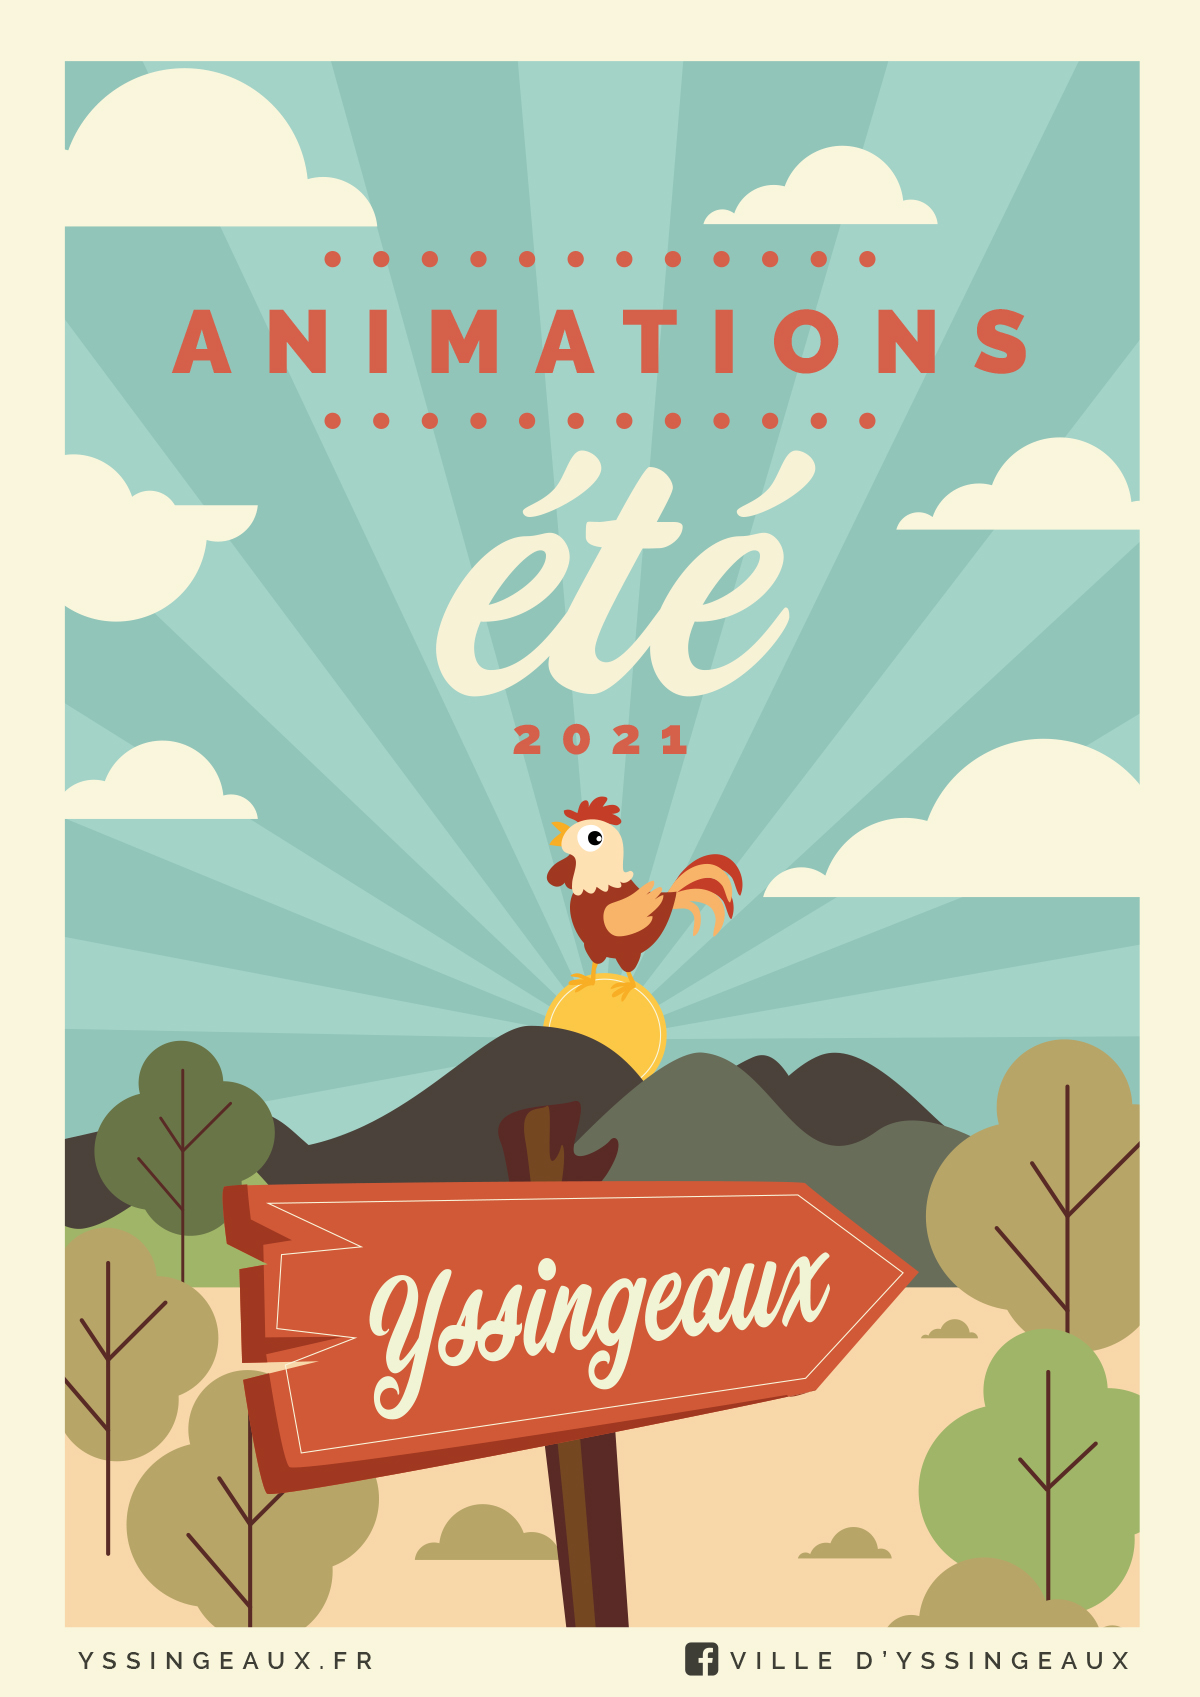 Programme d'Animations été 2021